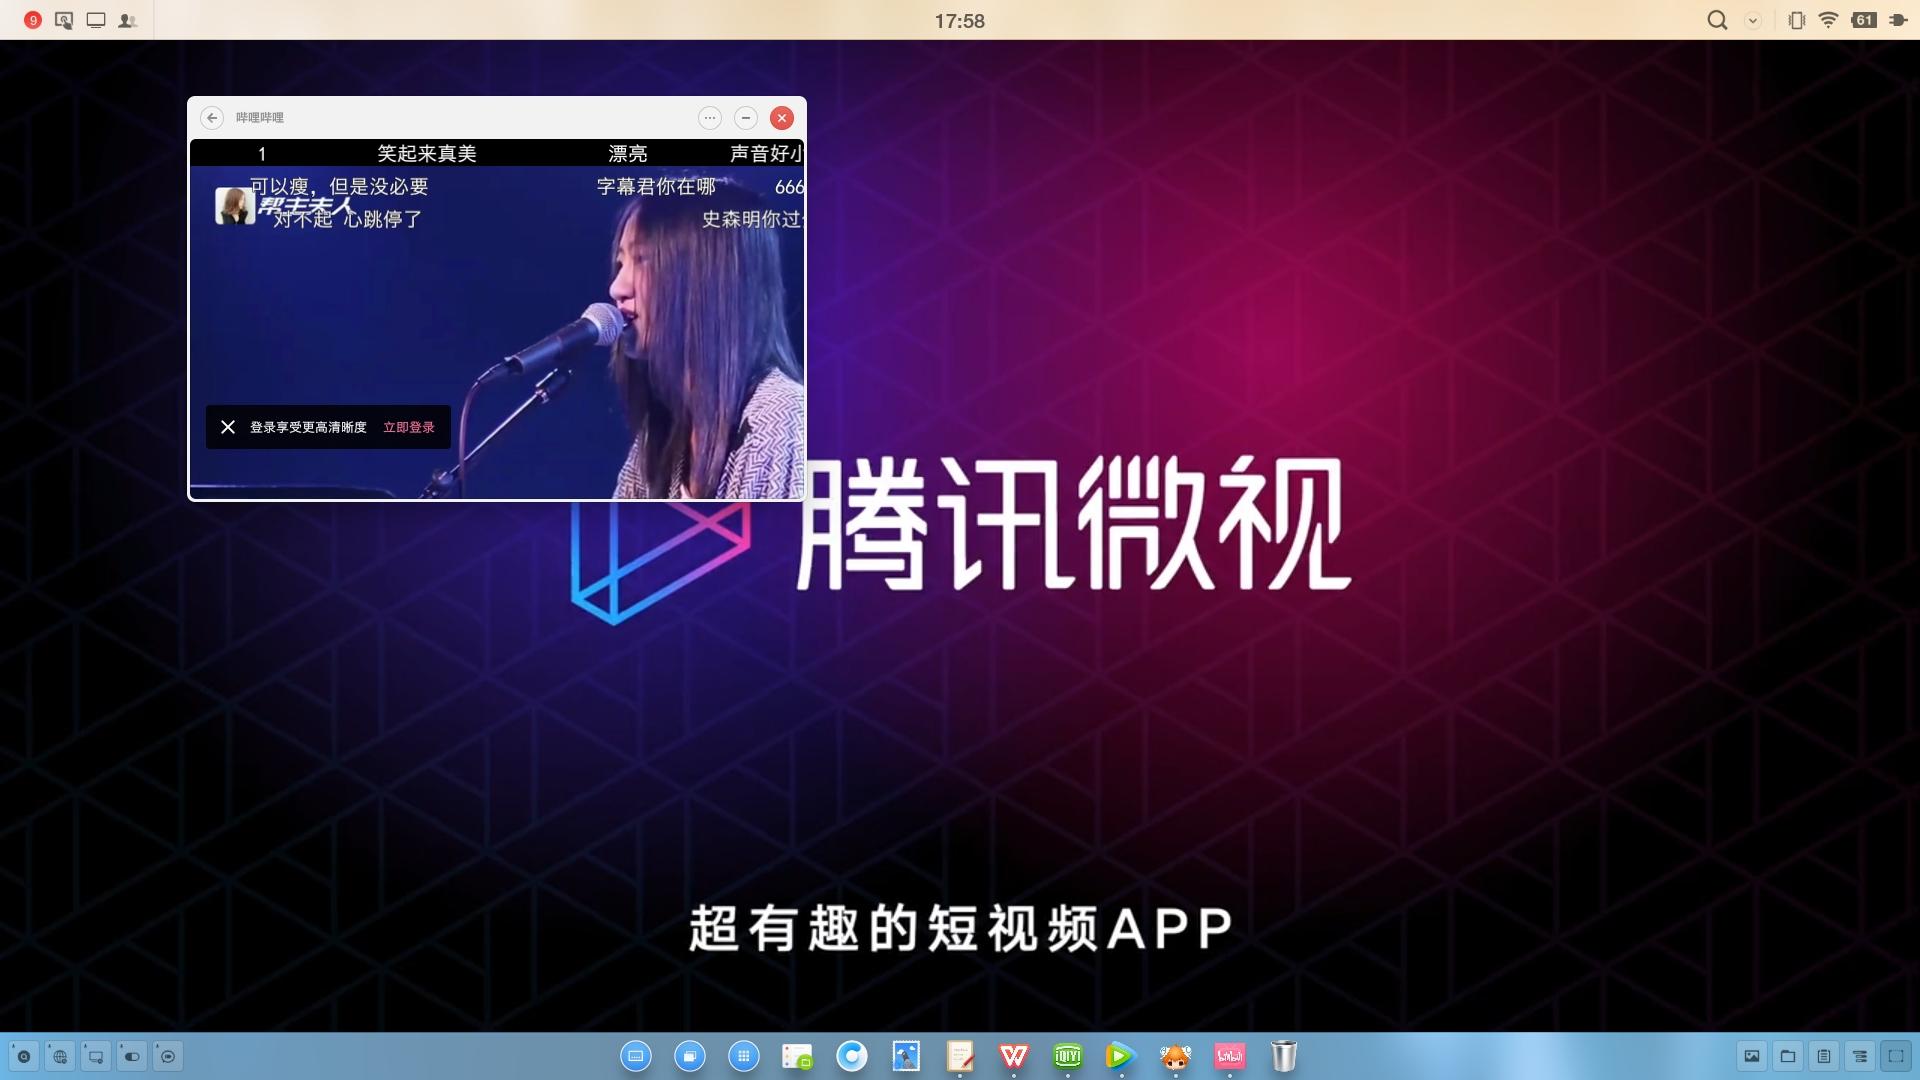 涂鸦_Screenshot_2018-09-18-17-58-12-333.jpg